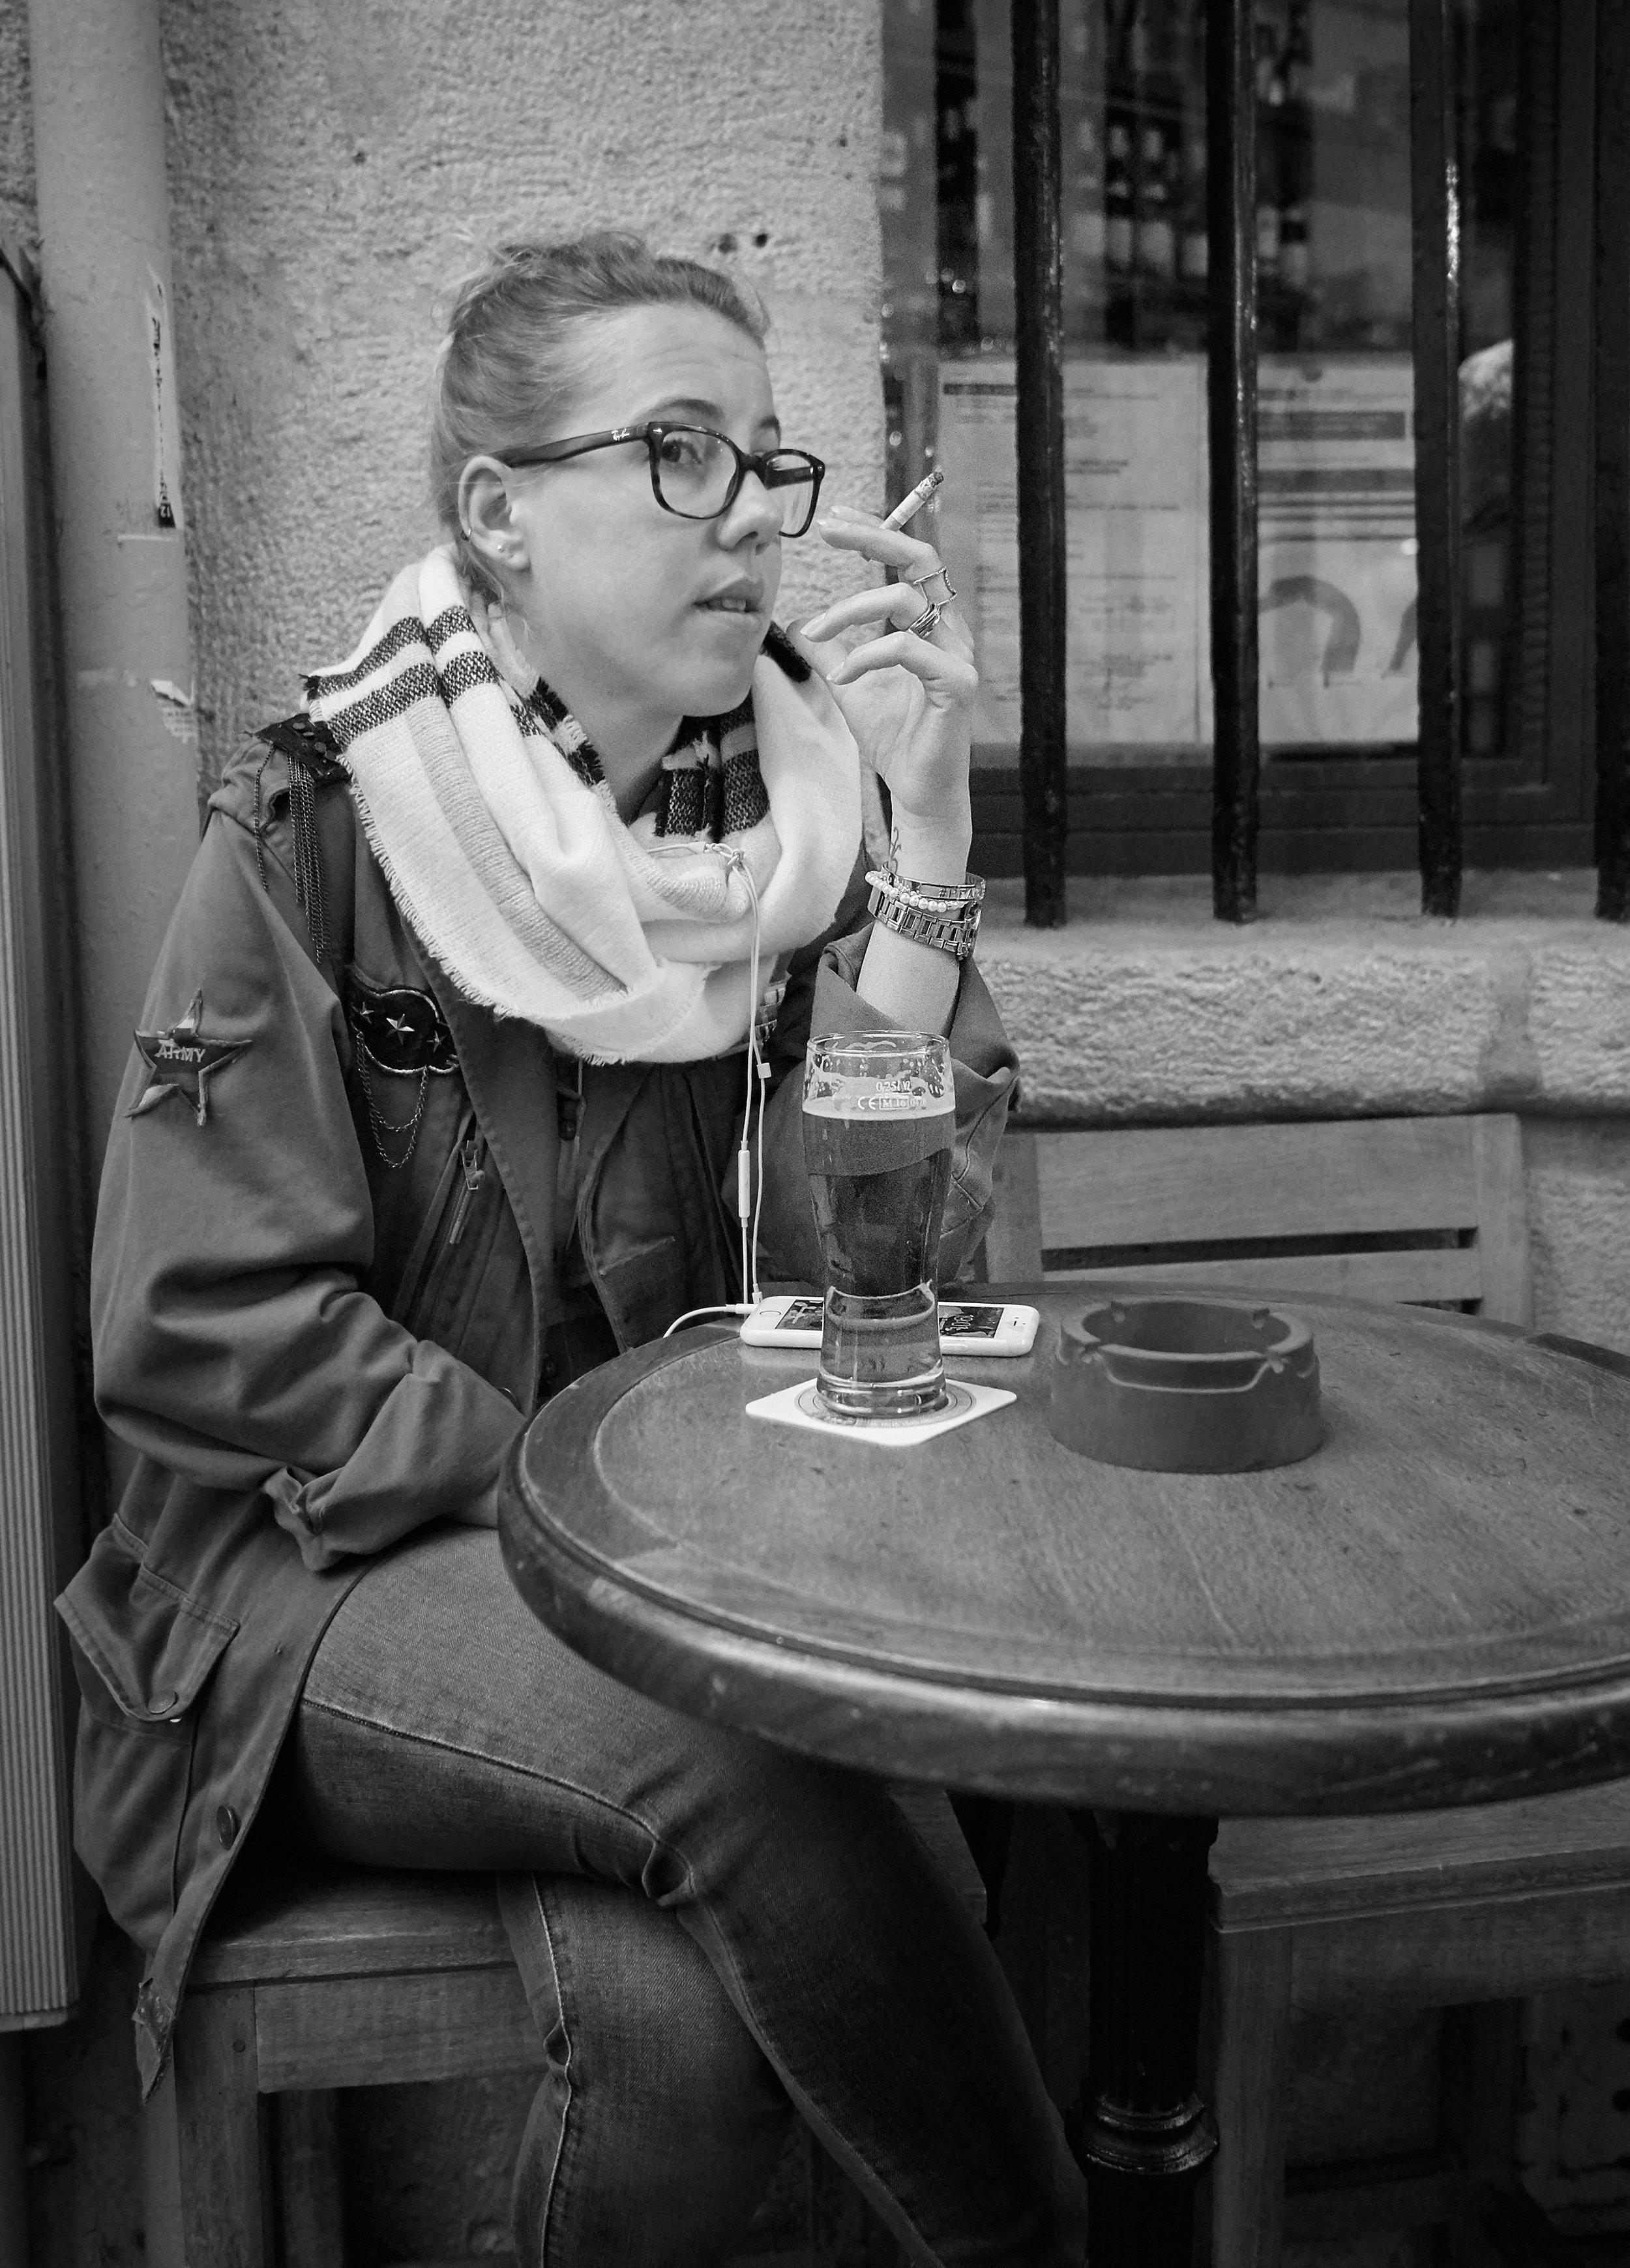 Smoking at table1600x1200 sRGB 1.jpg